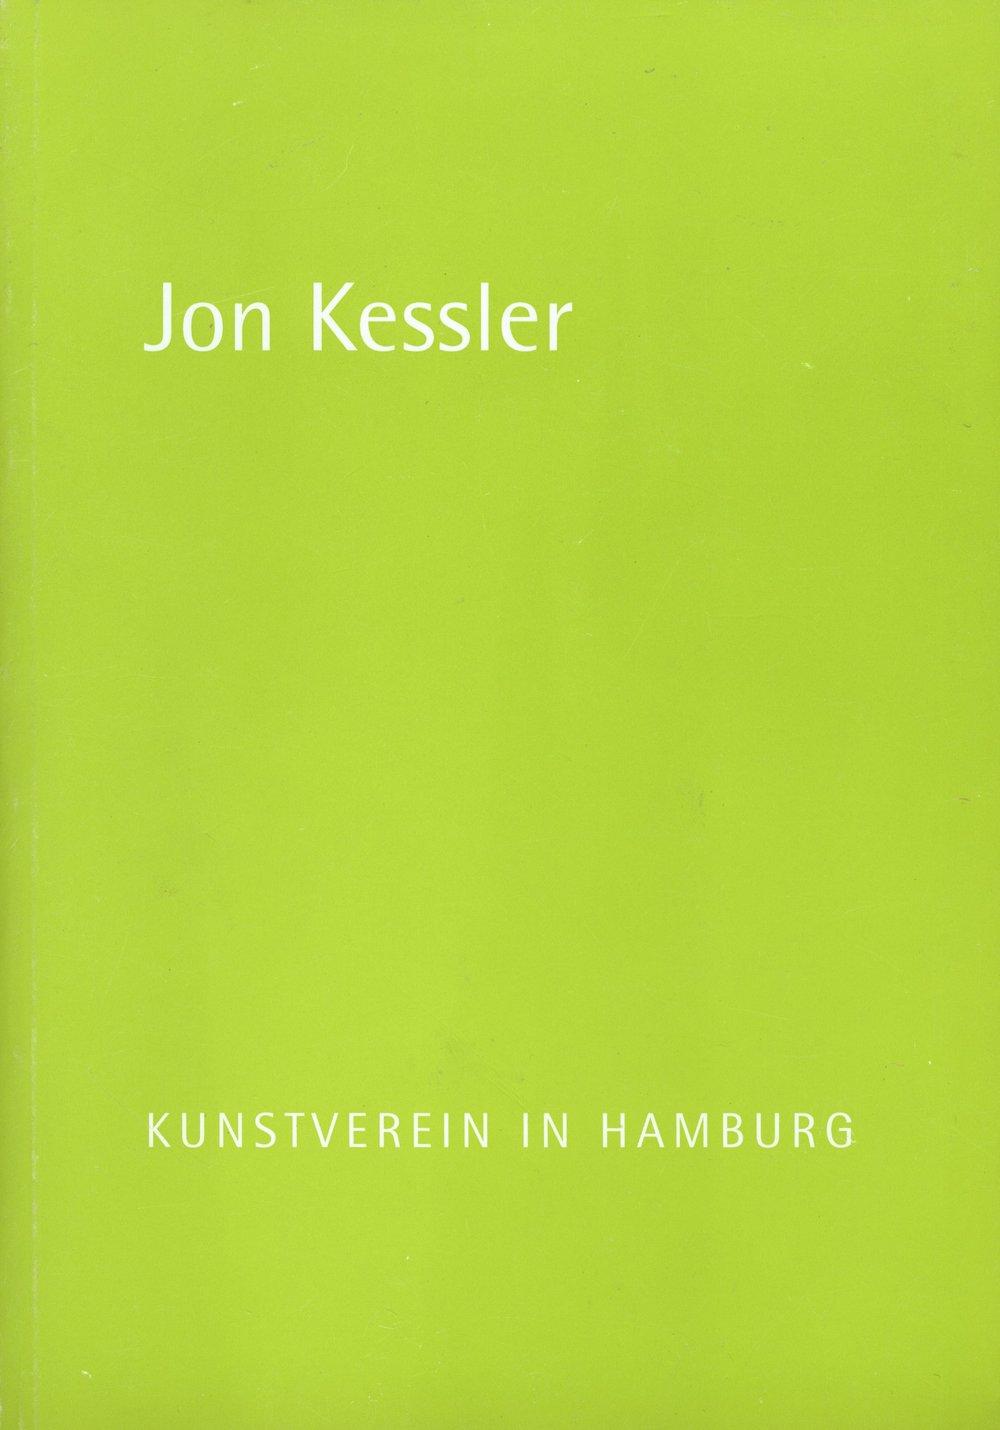 JK (Hamburg).jpg